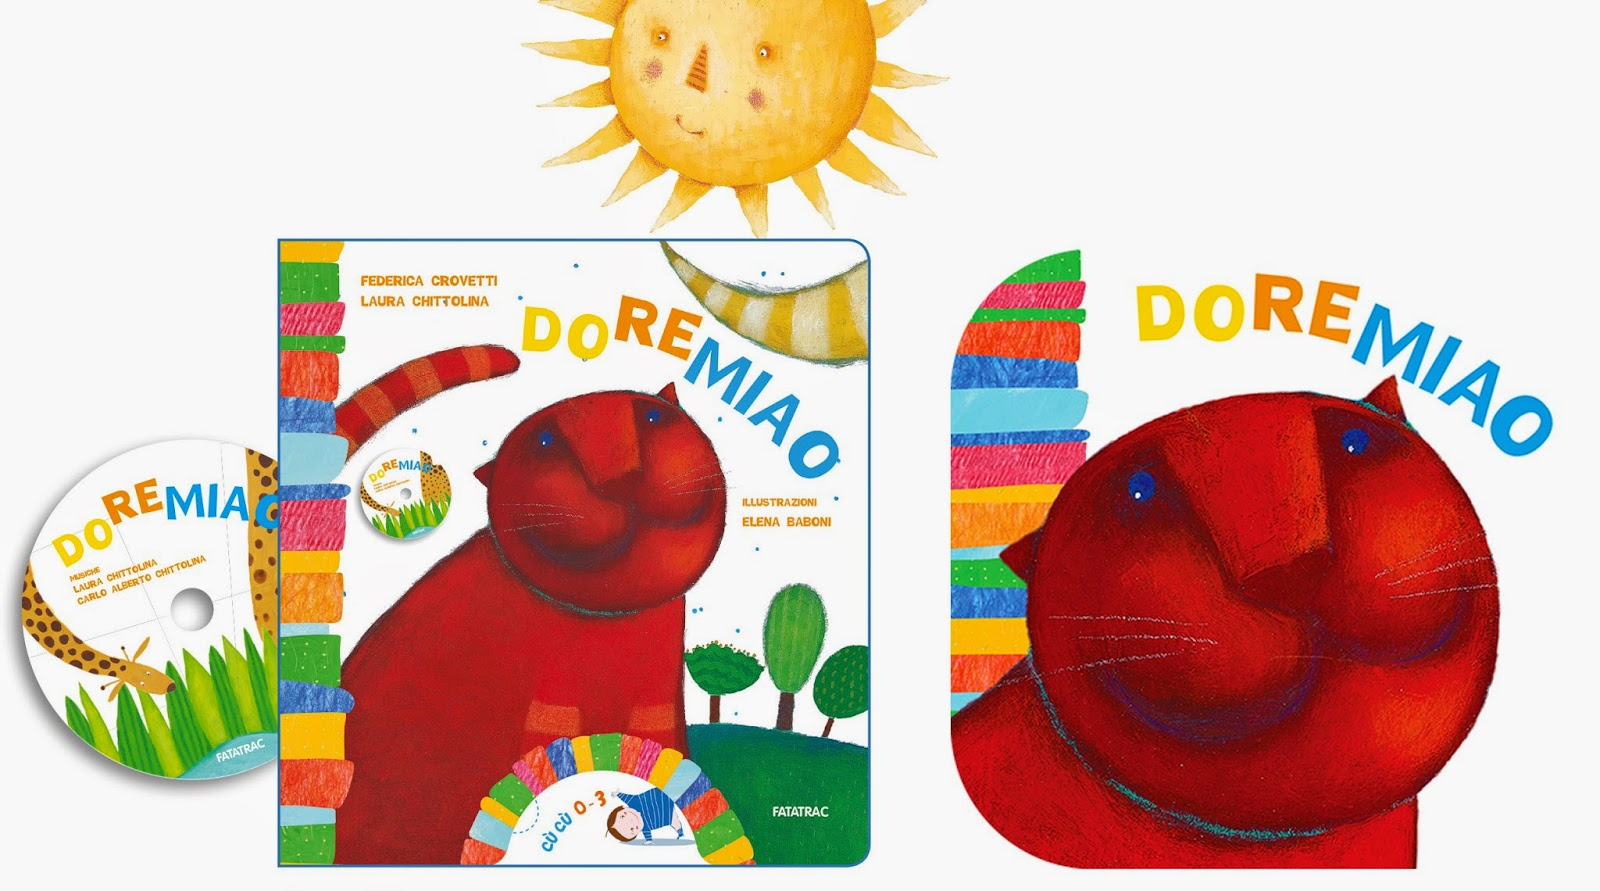 Bologna International Children's Book Fair – 30 marzo / 2 aprile 2015